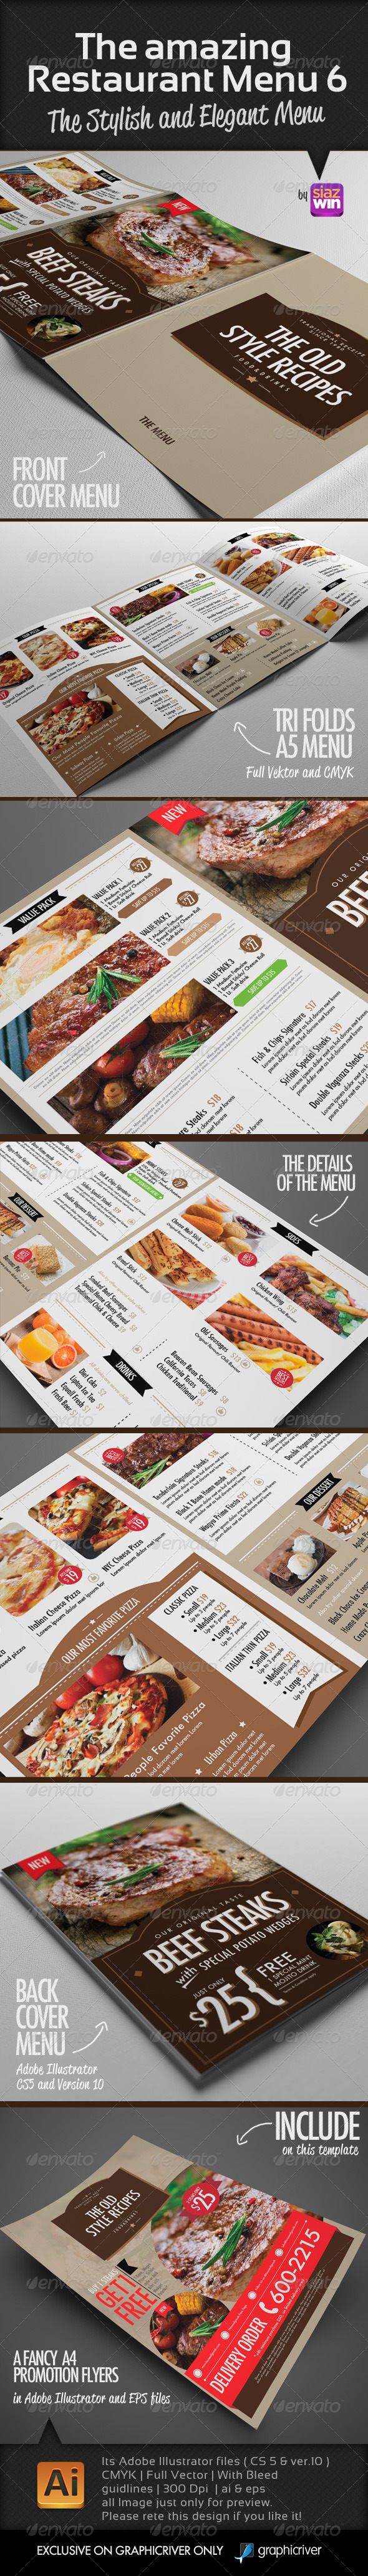 Cafe Menu Templates From Graphicriver